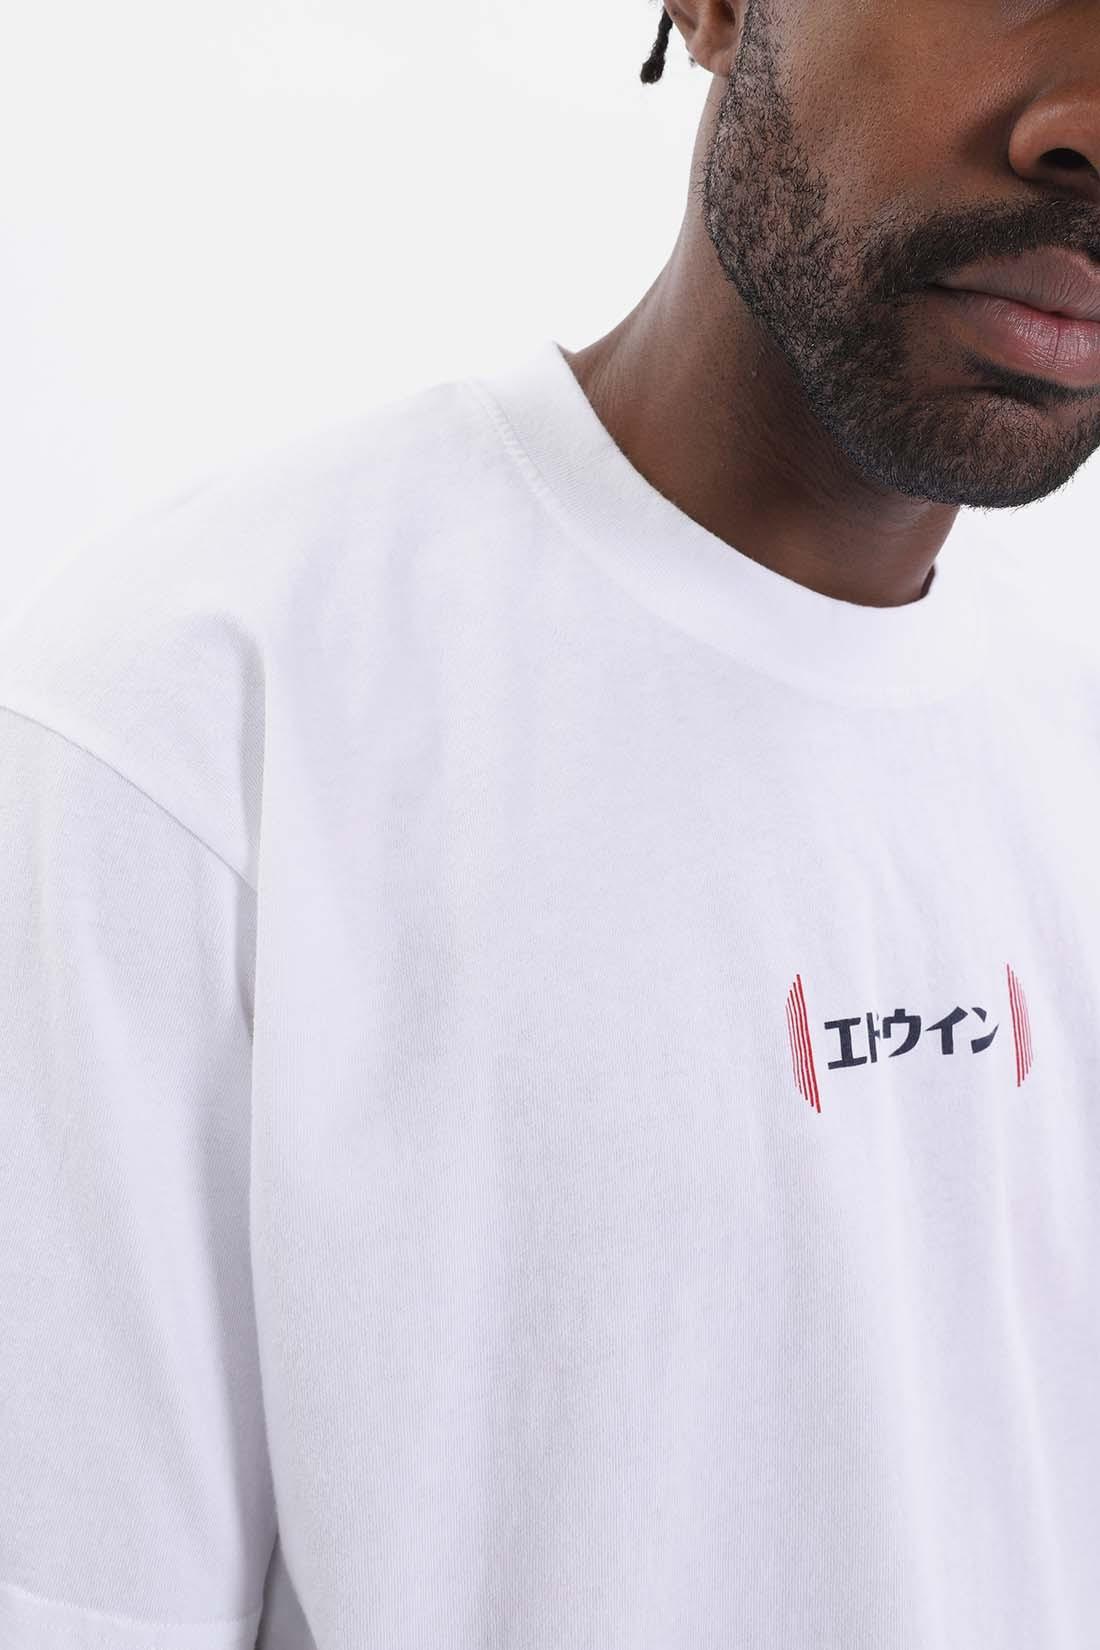 EDWIN / Aurora cotton t shirt White